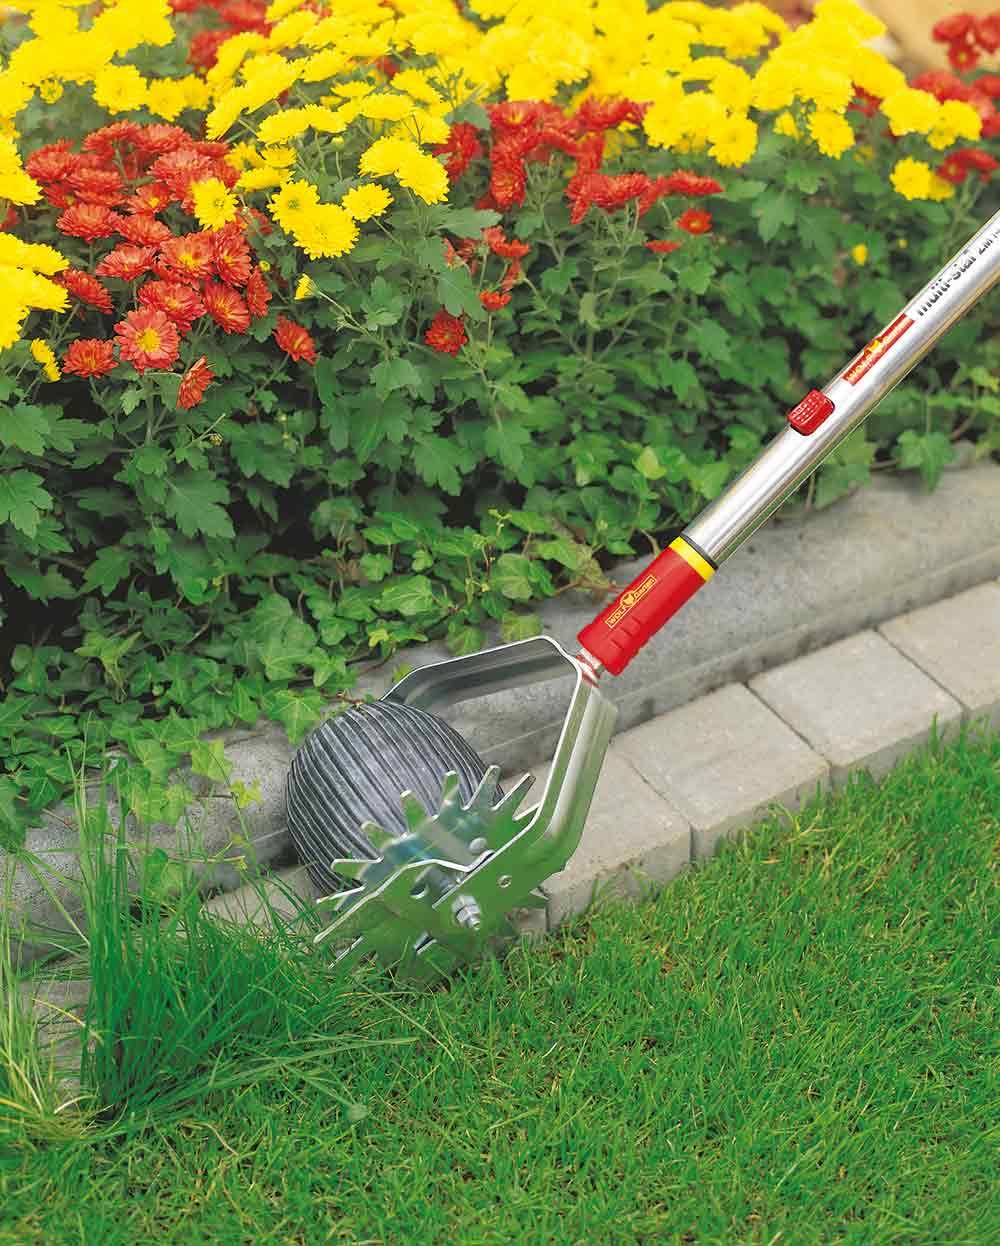 Rasenkantenschneider mal anders. Foto: Wolf Garten.